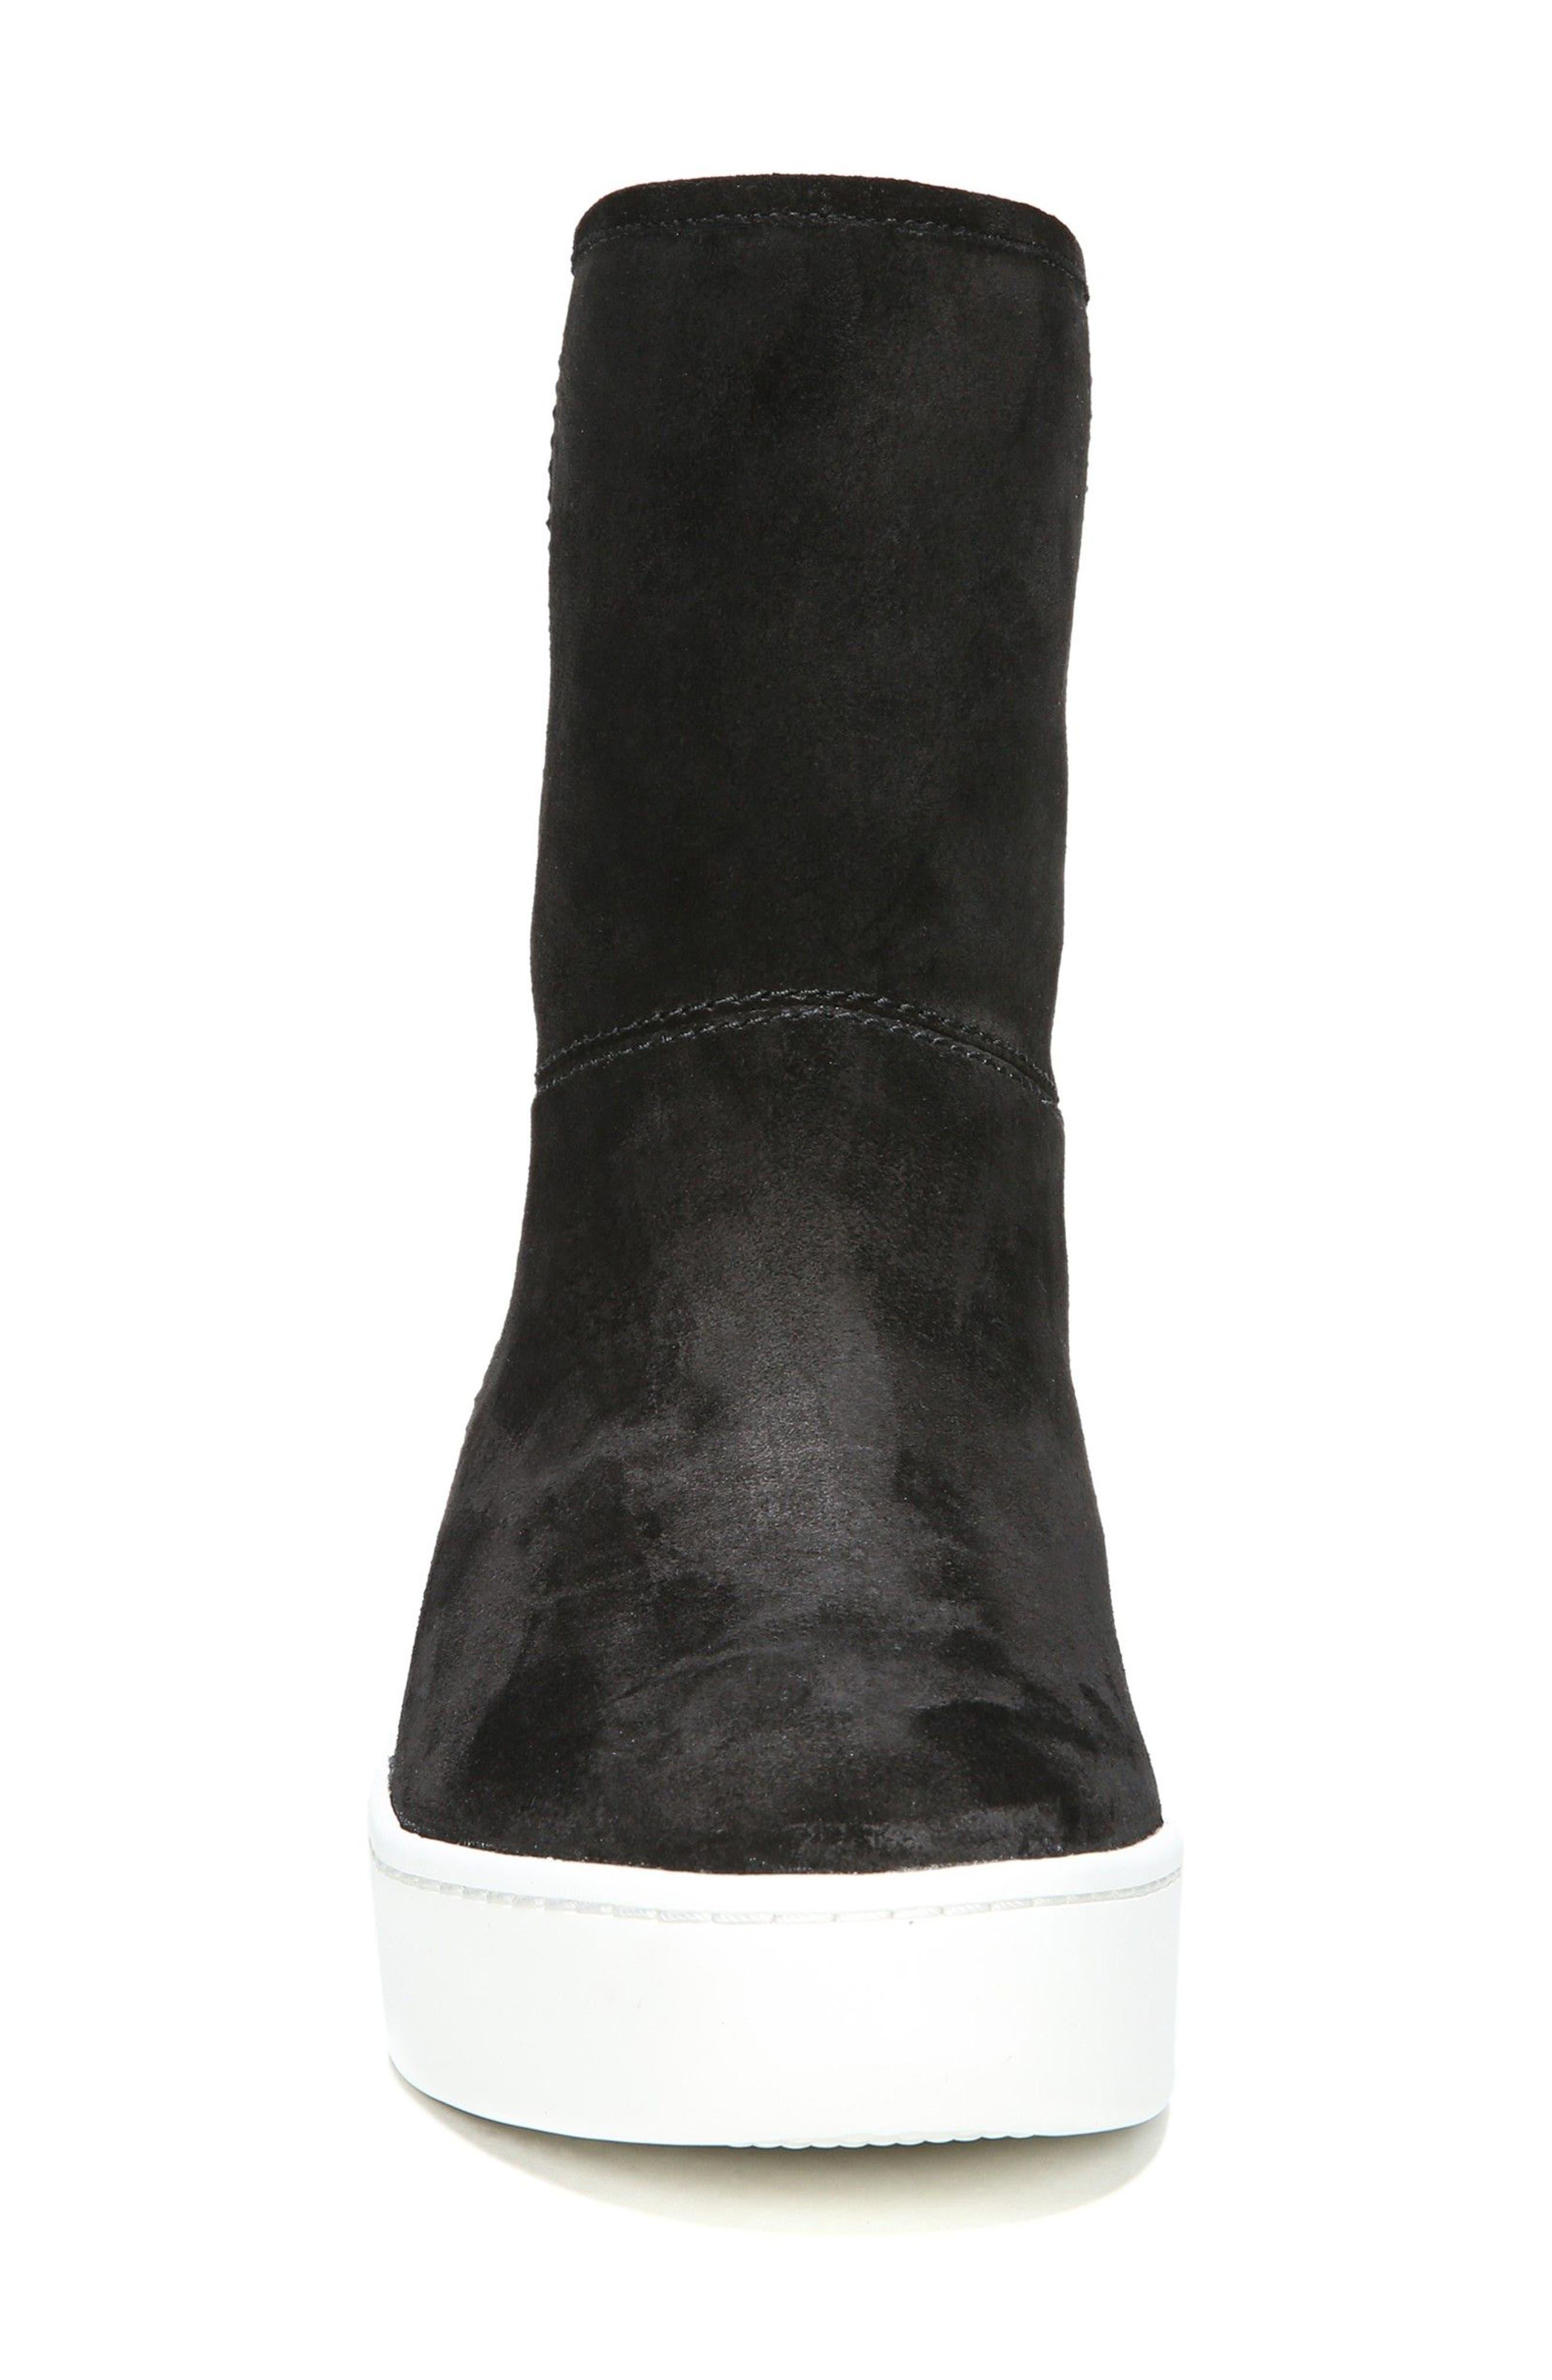 Elona Genuine Shearling Lined Sneaker Boot,                             Alternate thumbnail 4, color,                             001